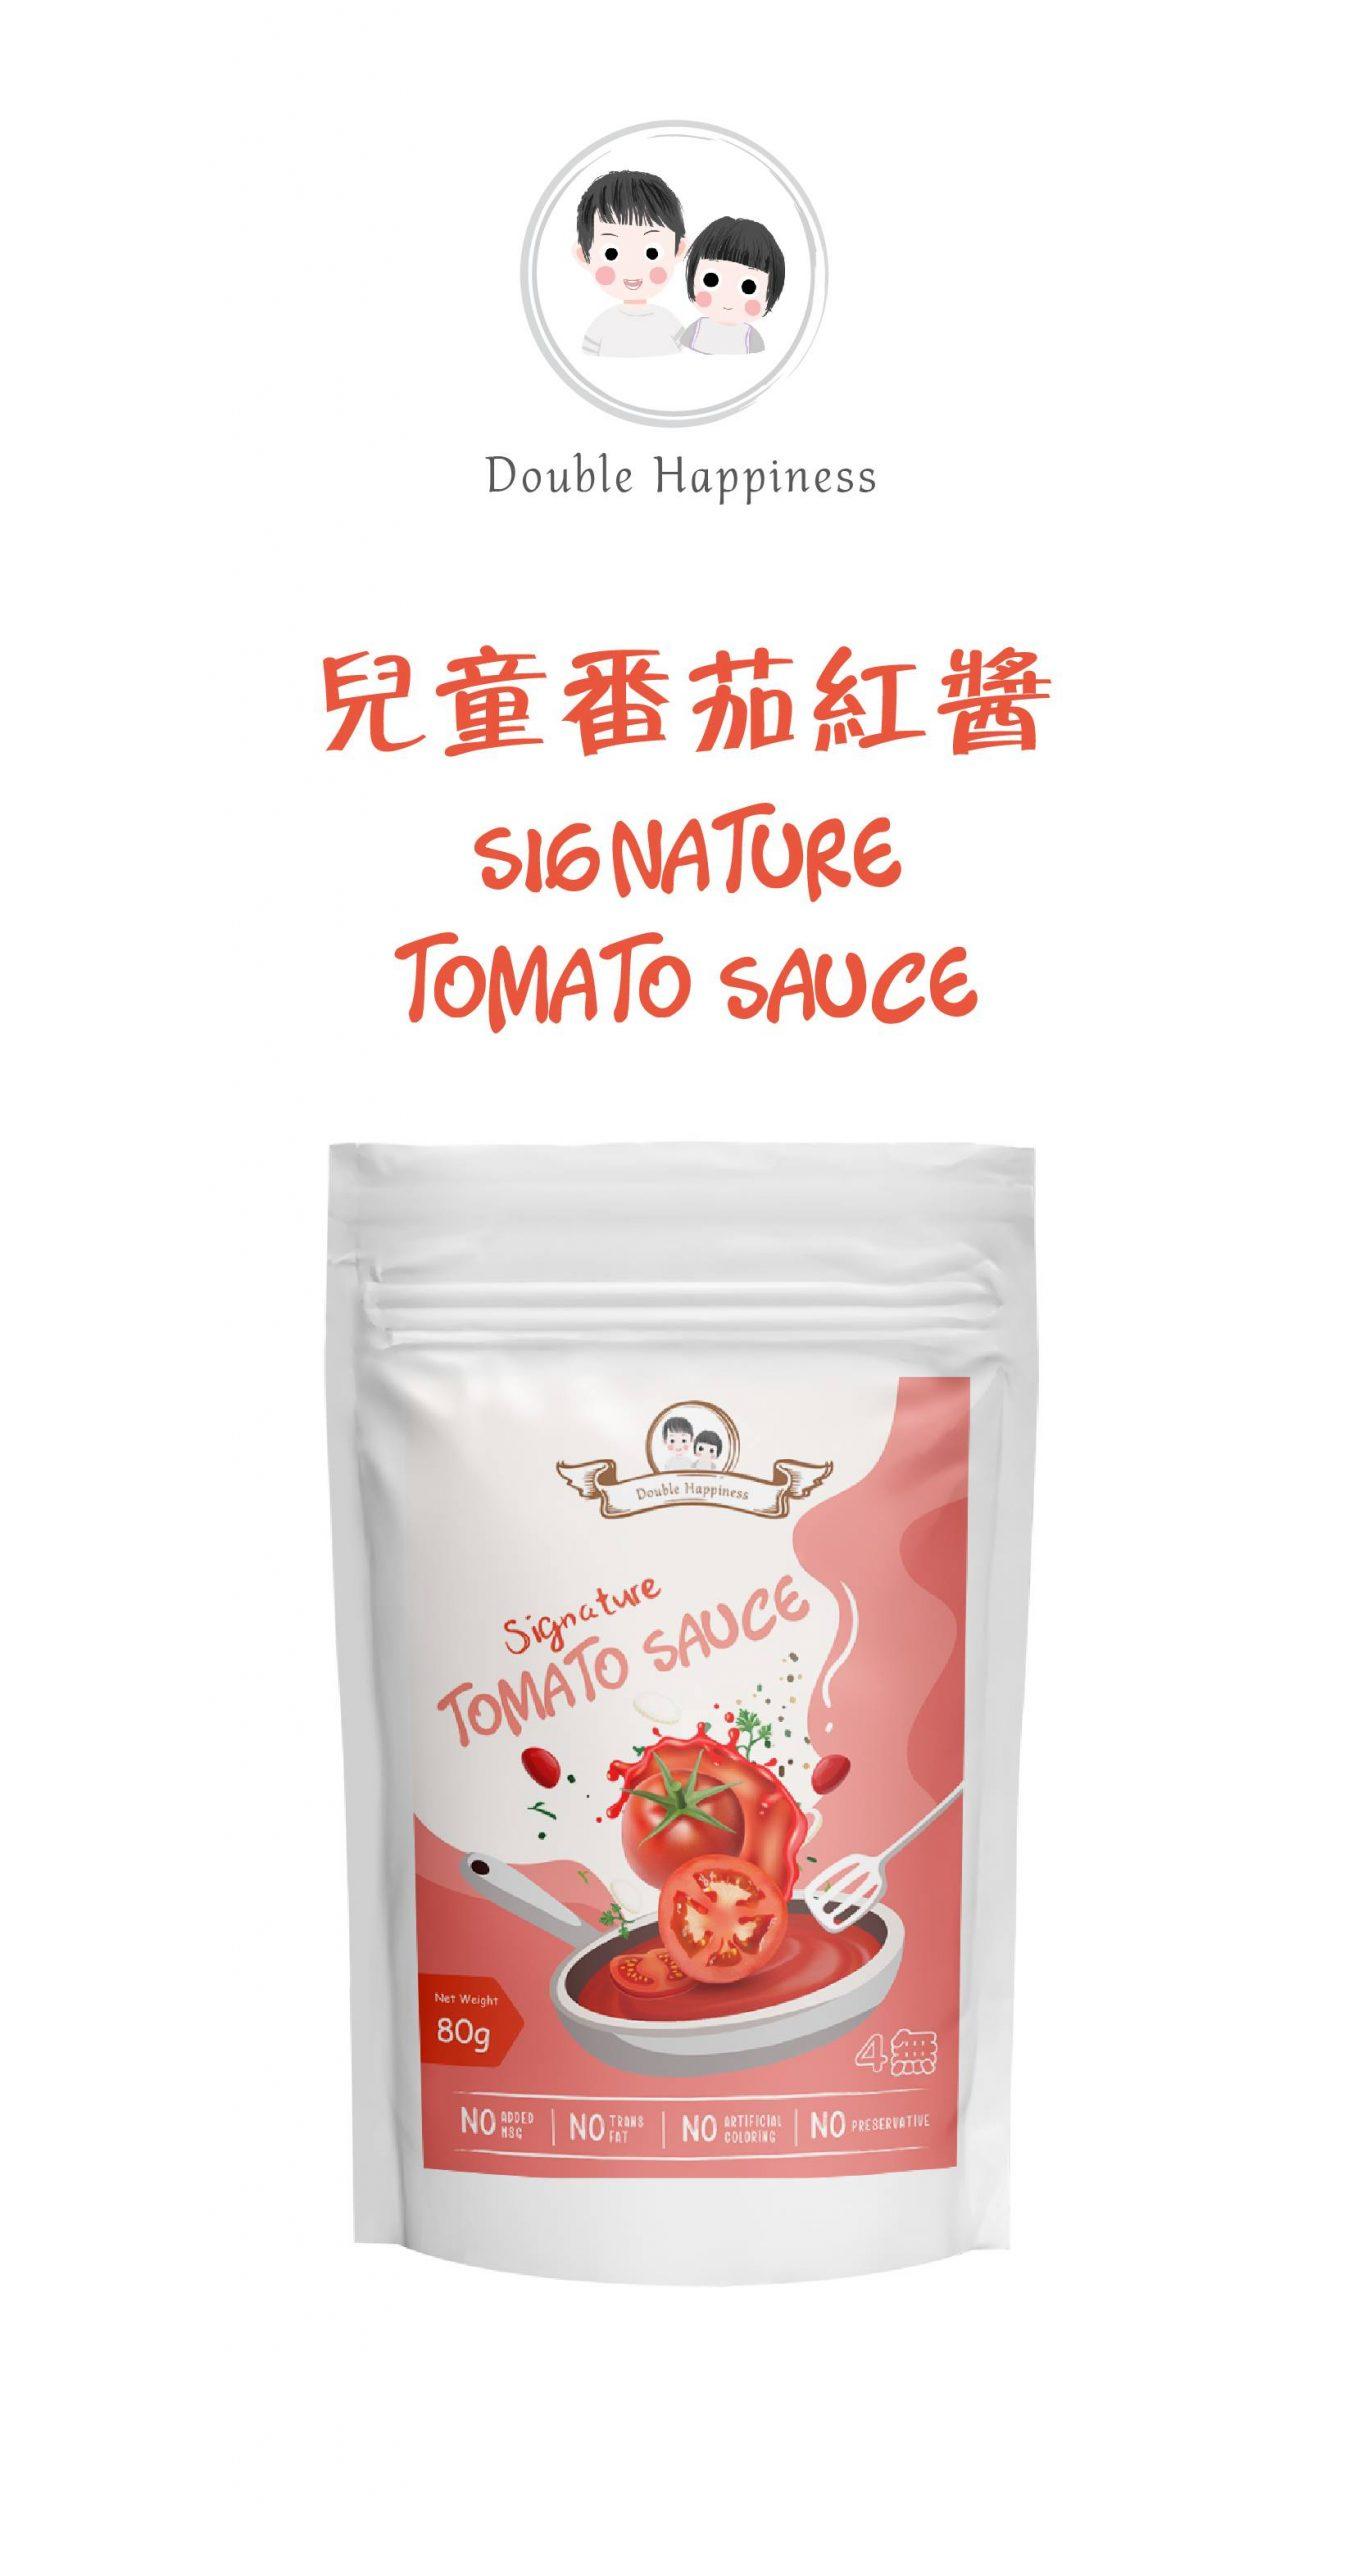 Signature Tomato Sauce